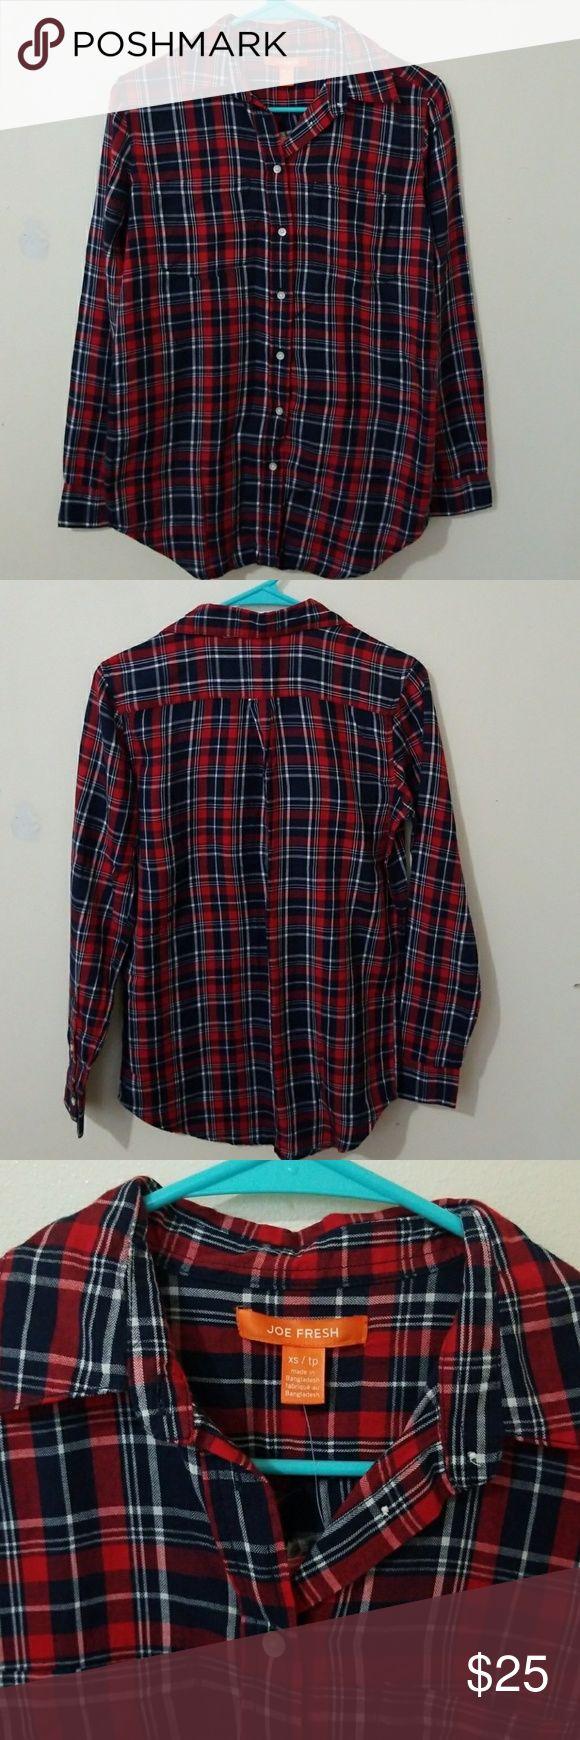 Joe Fresh shirt Joe Fresh womens plaid button down shirt. Never worn with tags Joe Fresh Tops Button Down Shirts